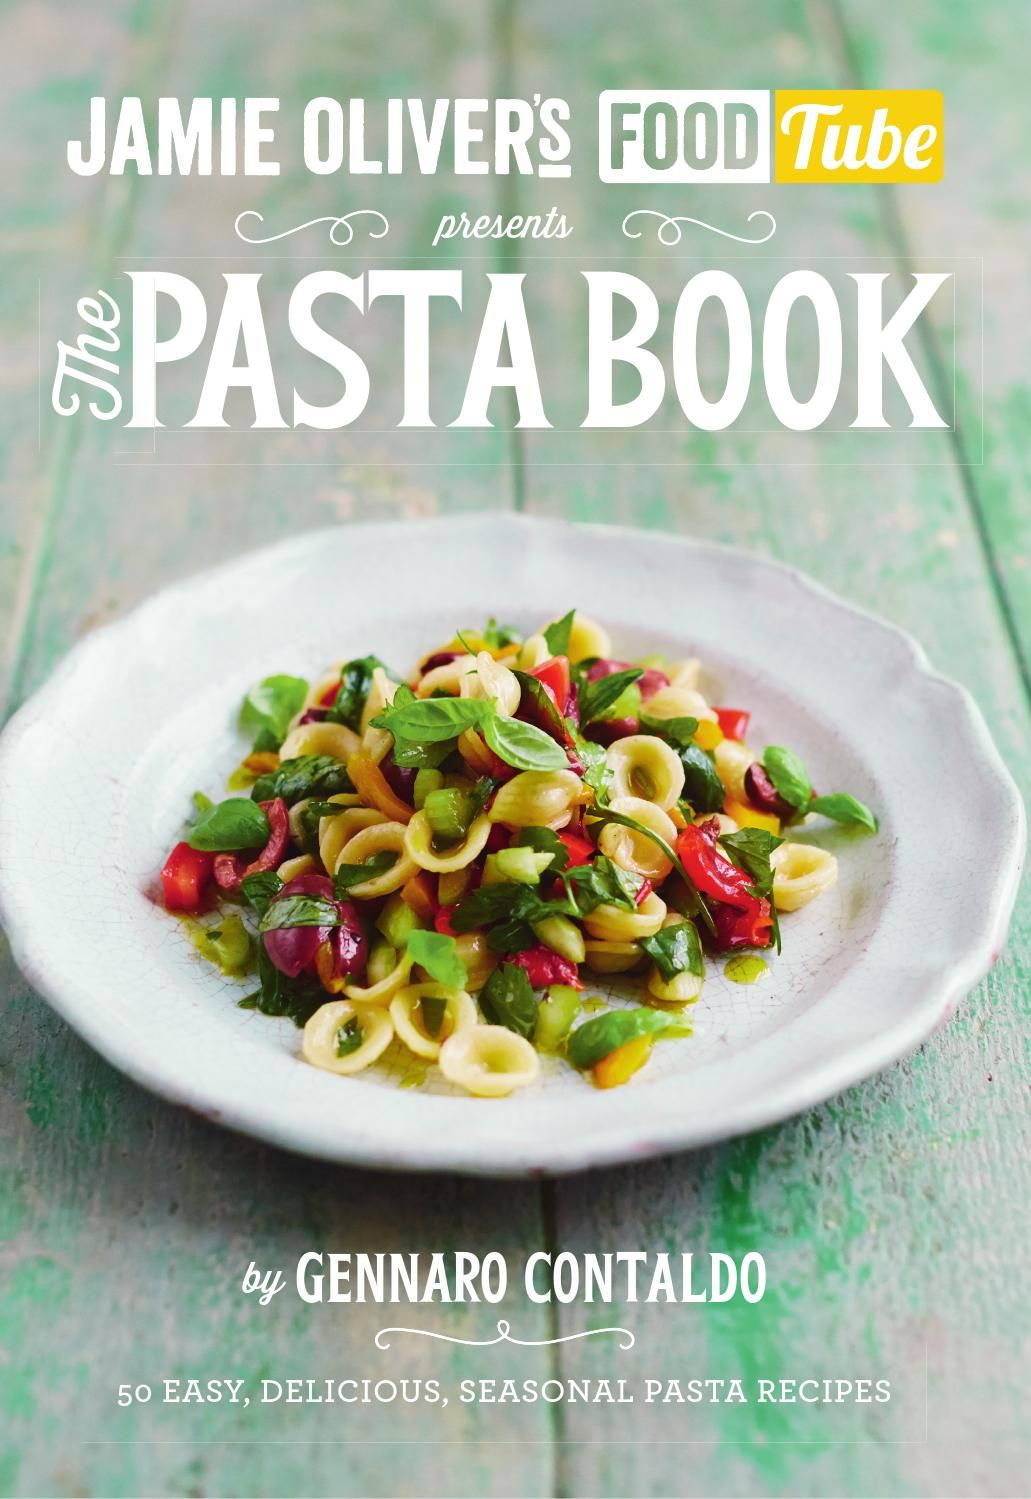 the pasta book eblad jamie oliver recipes italian recipes pasta recipes pinterest